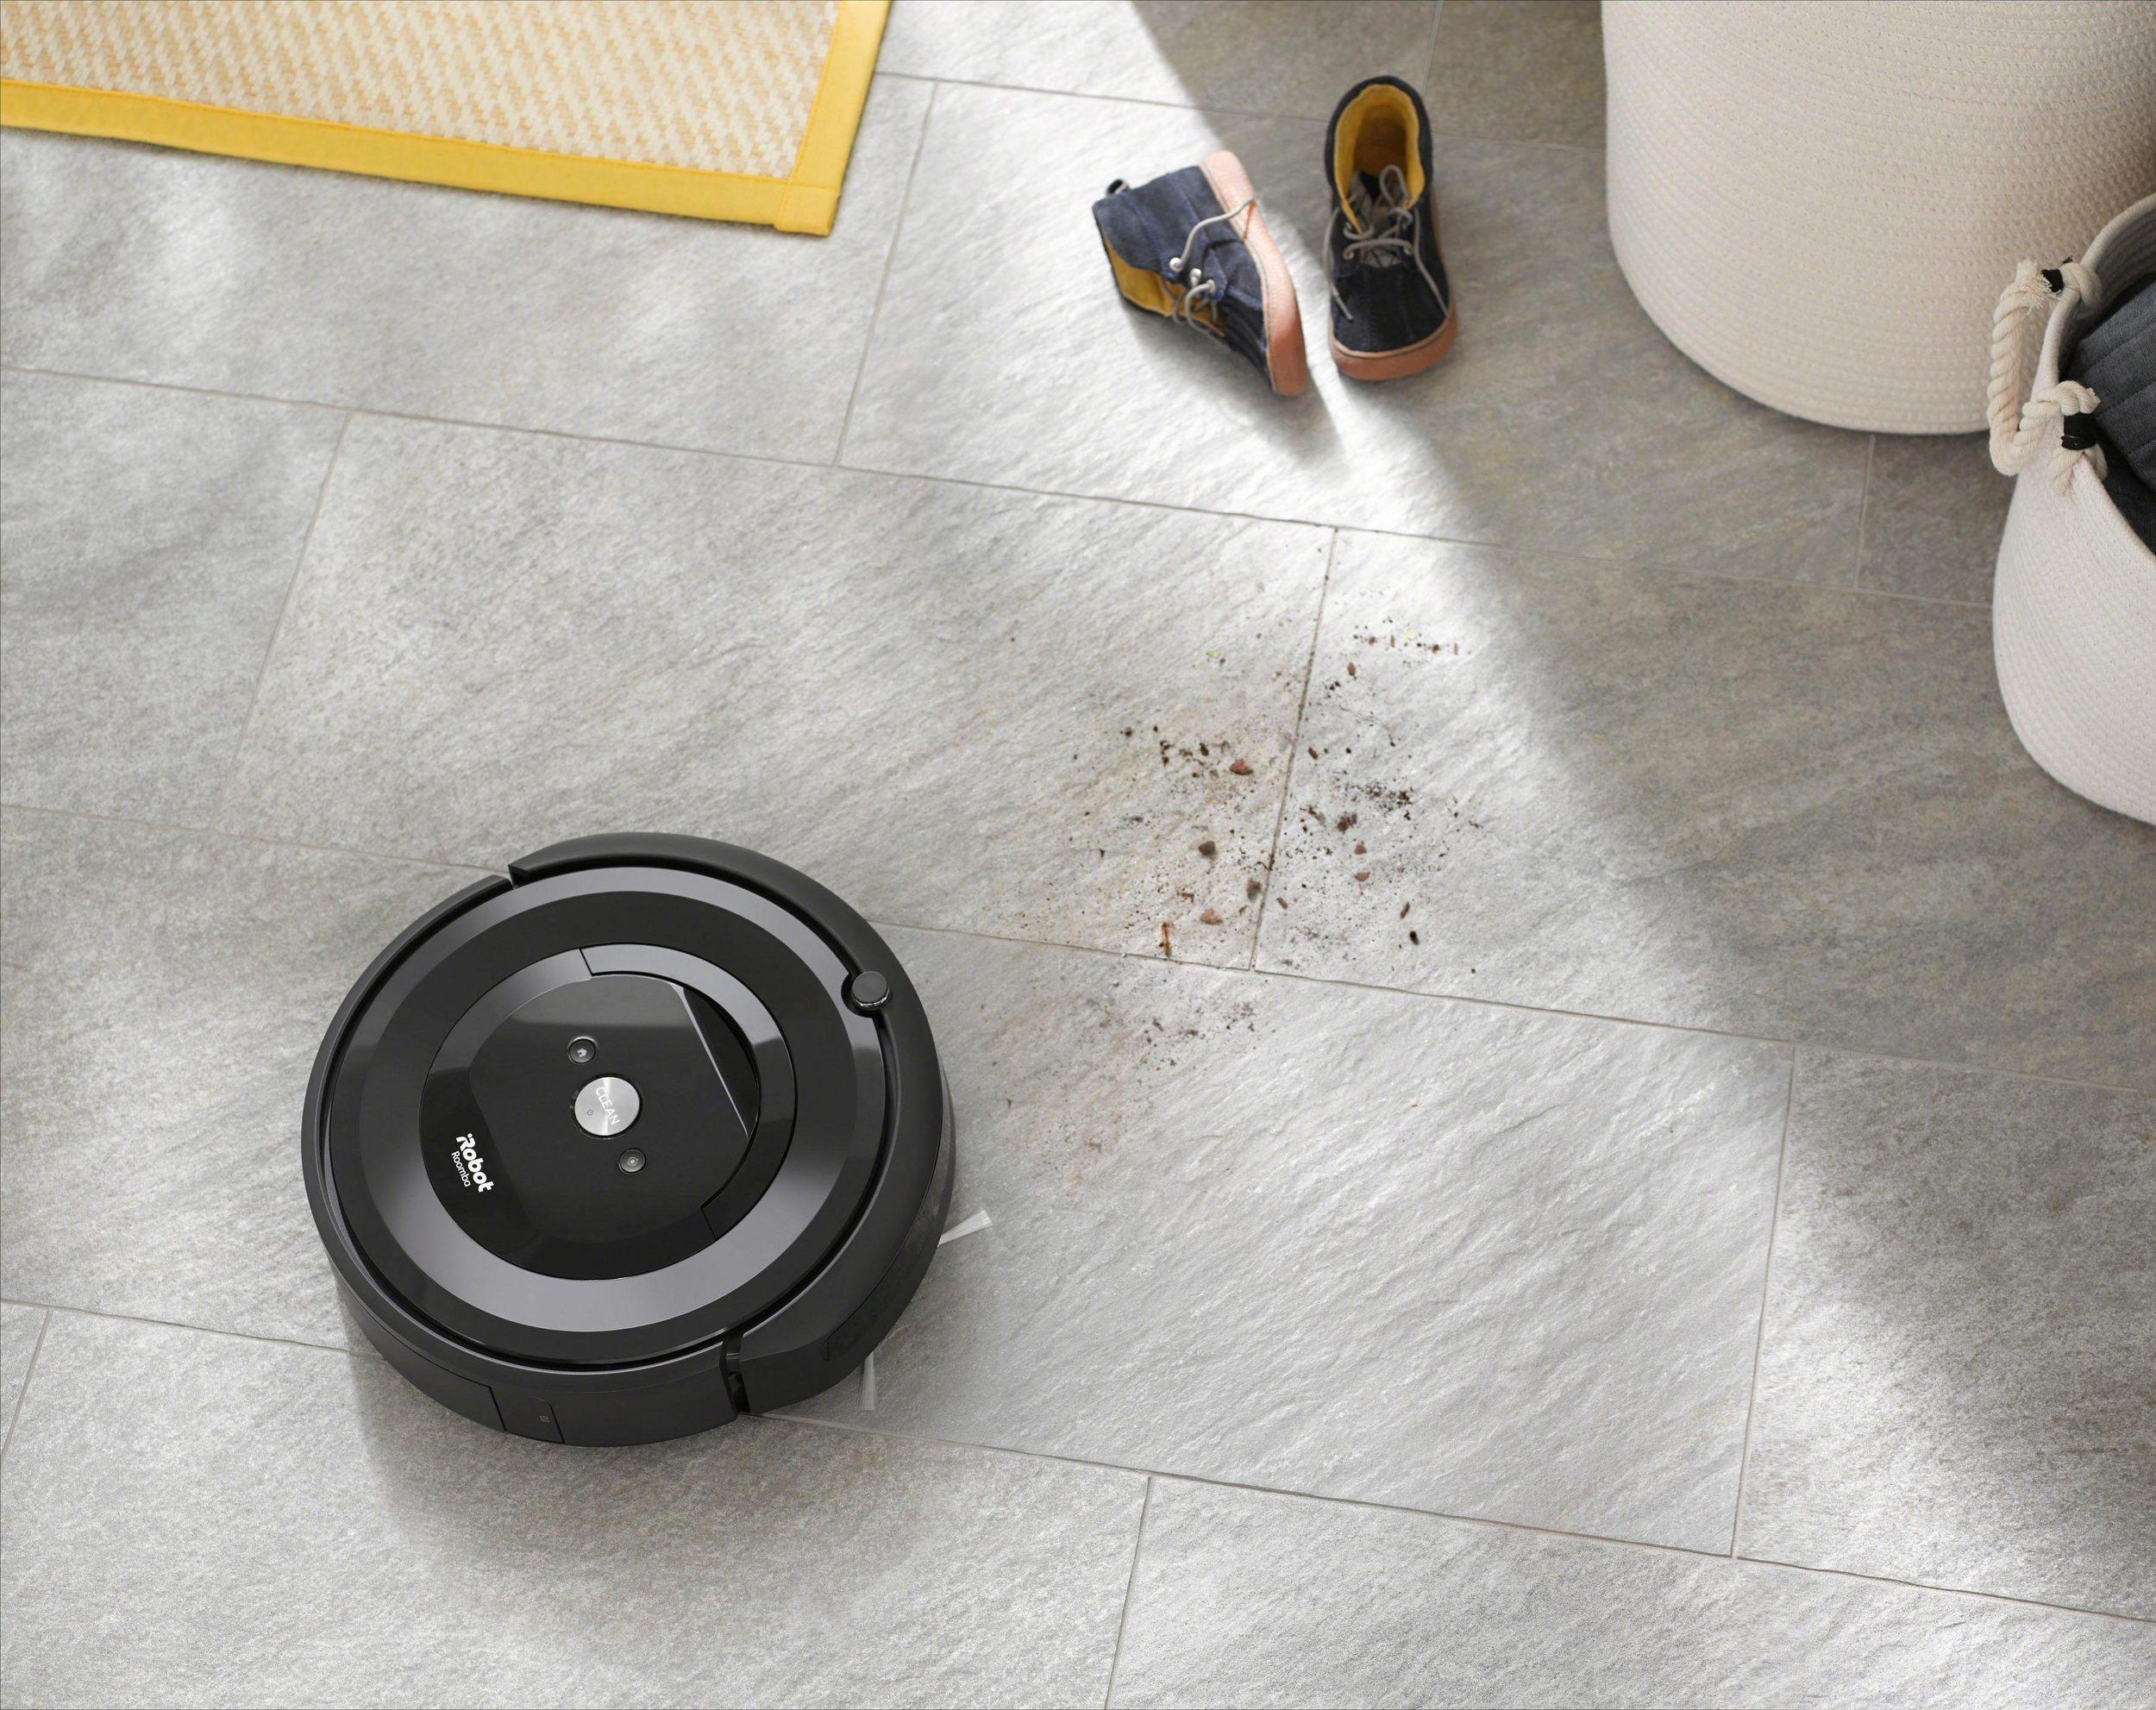 Roomba e5158 von iRobot